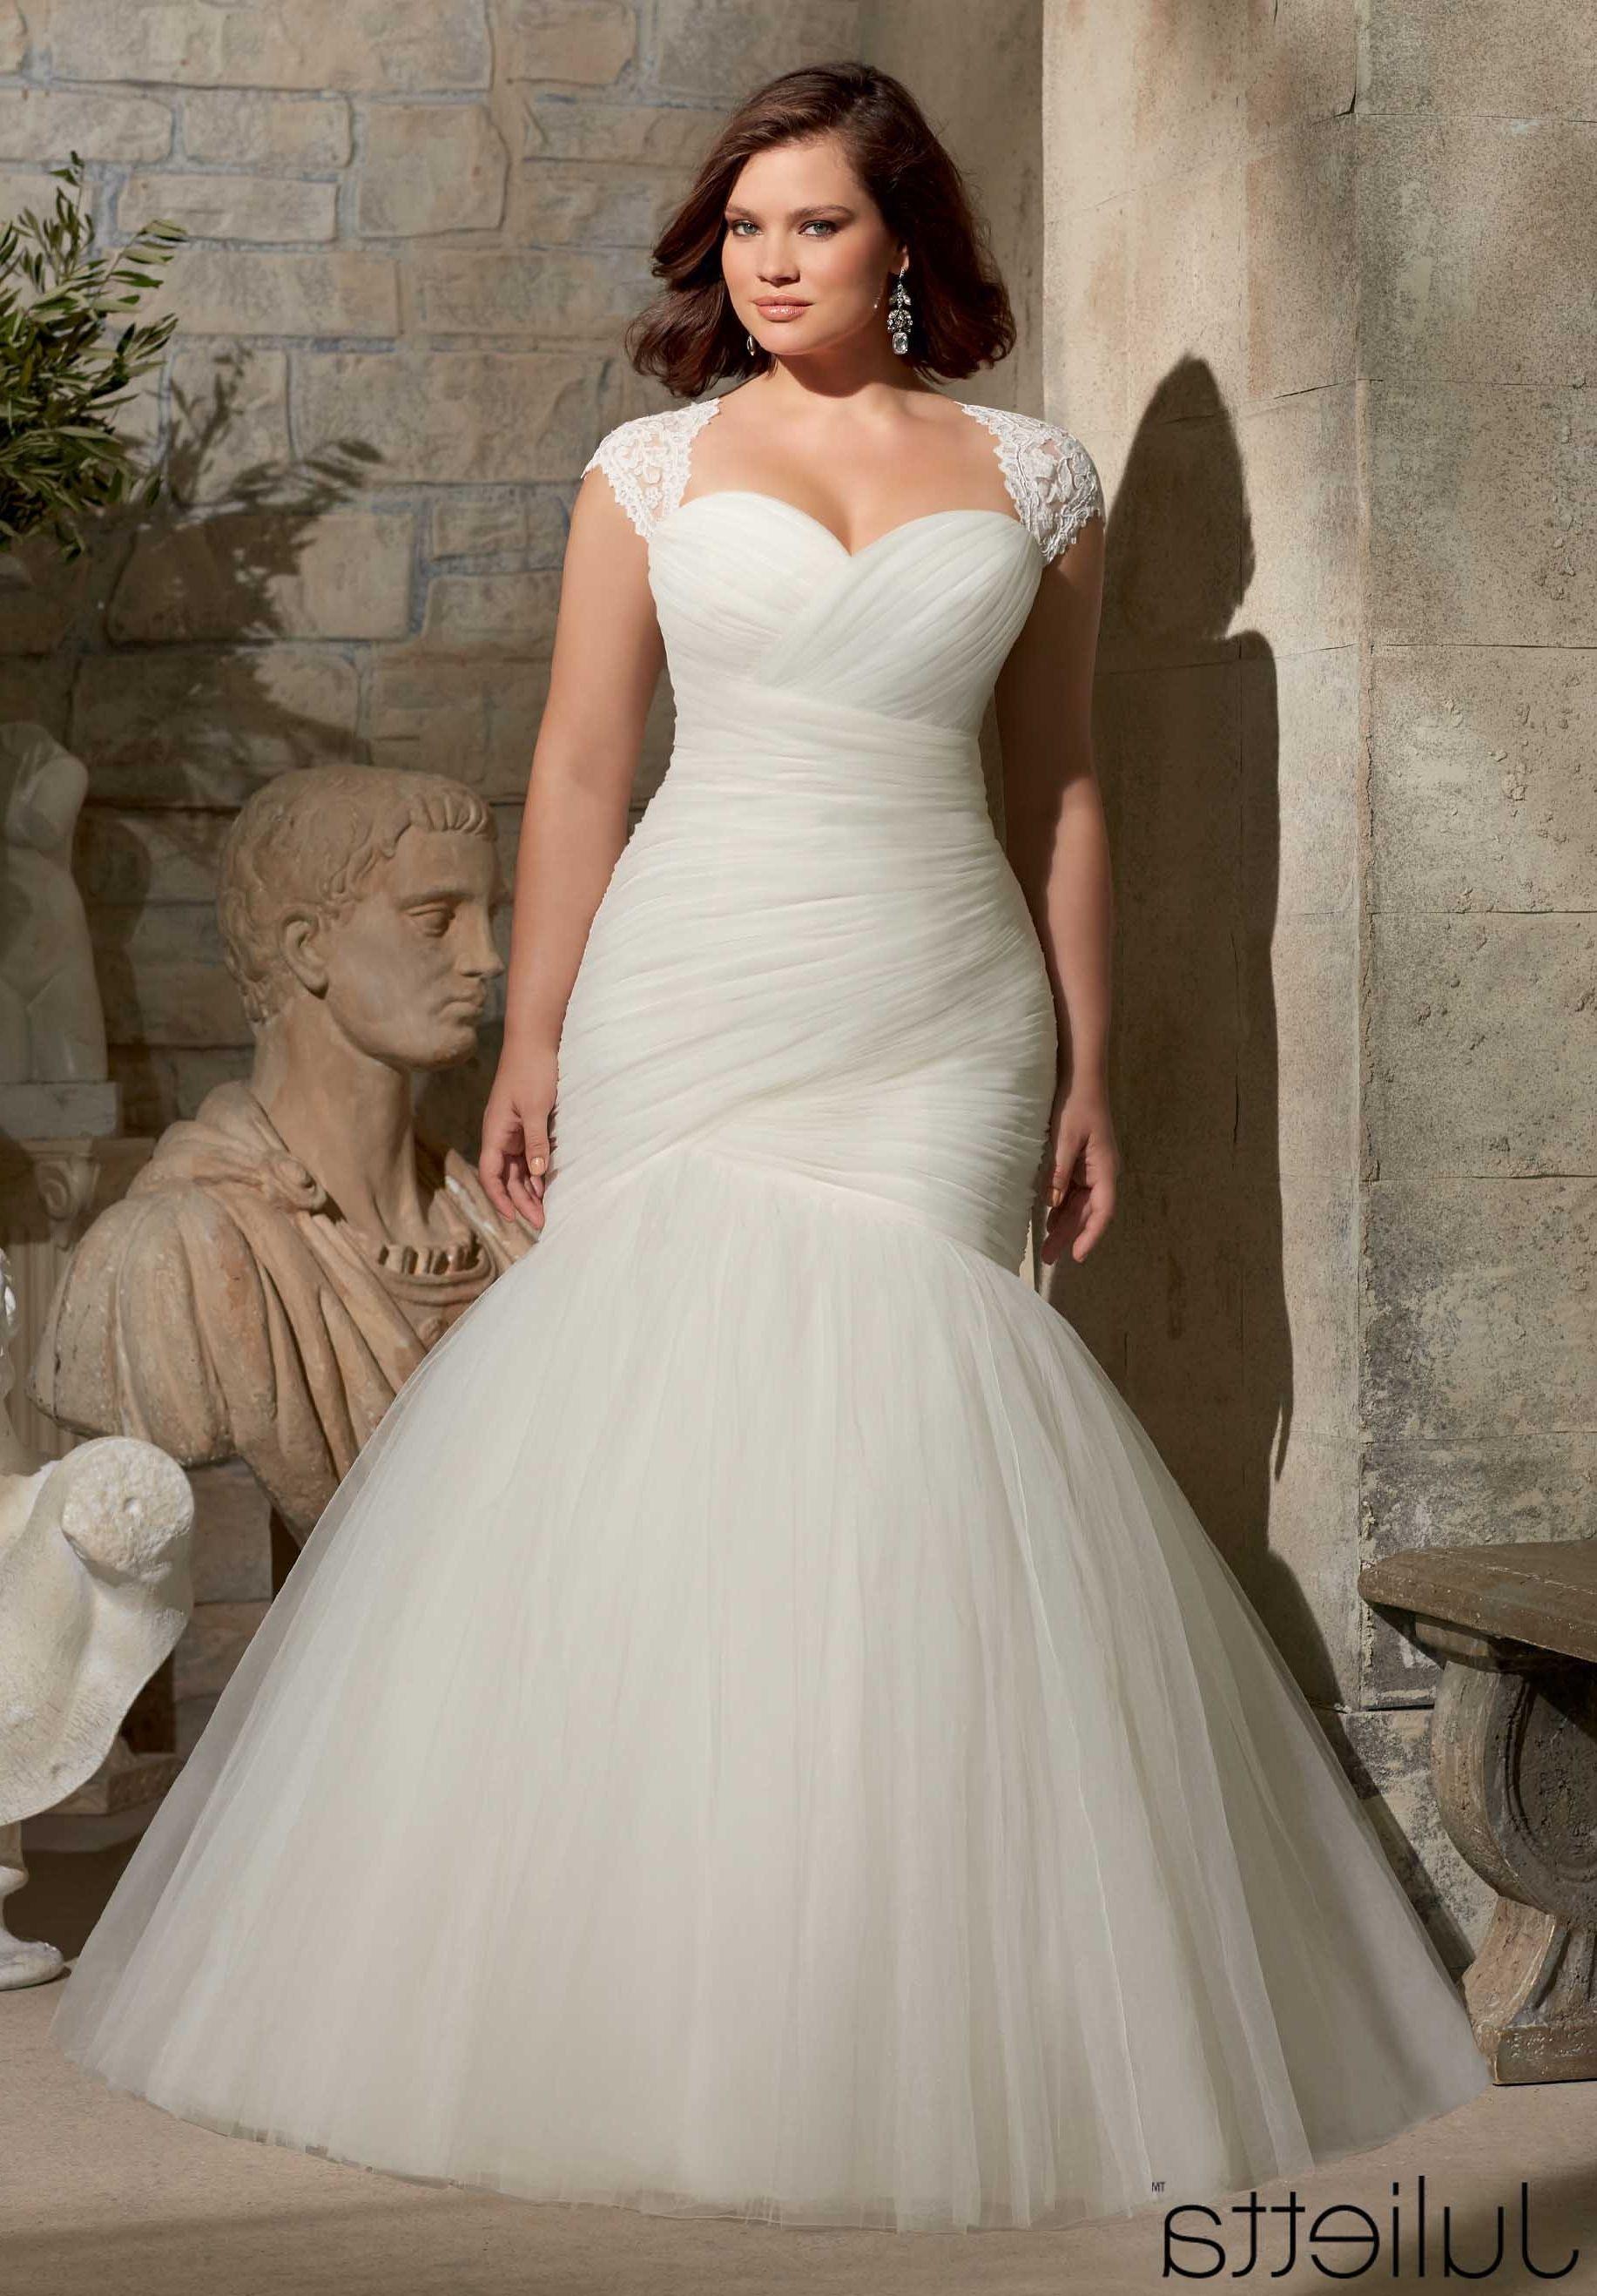 Wedding Dresses For Overweight Brides Wedding Dresses Plus Size Wedding Gowns Wedding Dress Styles